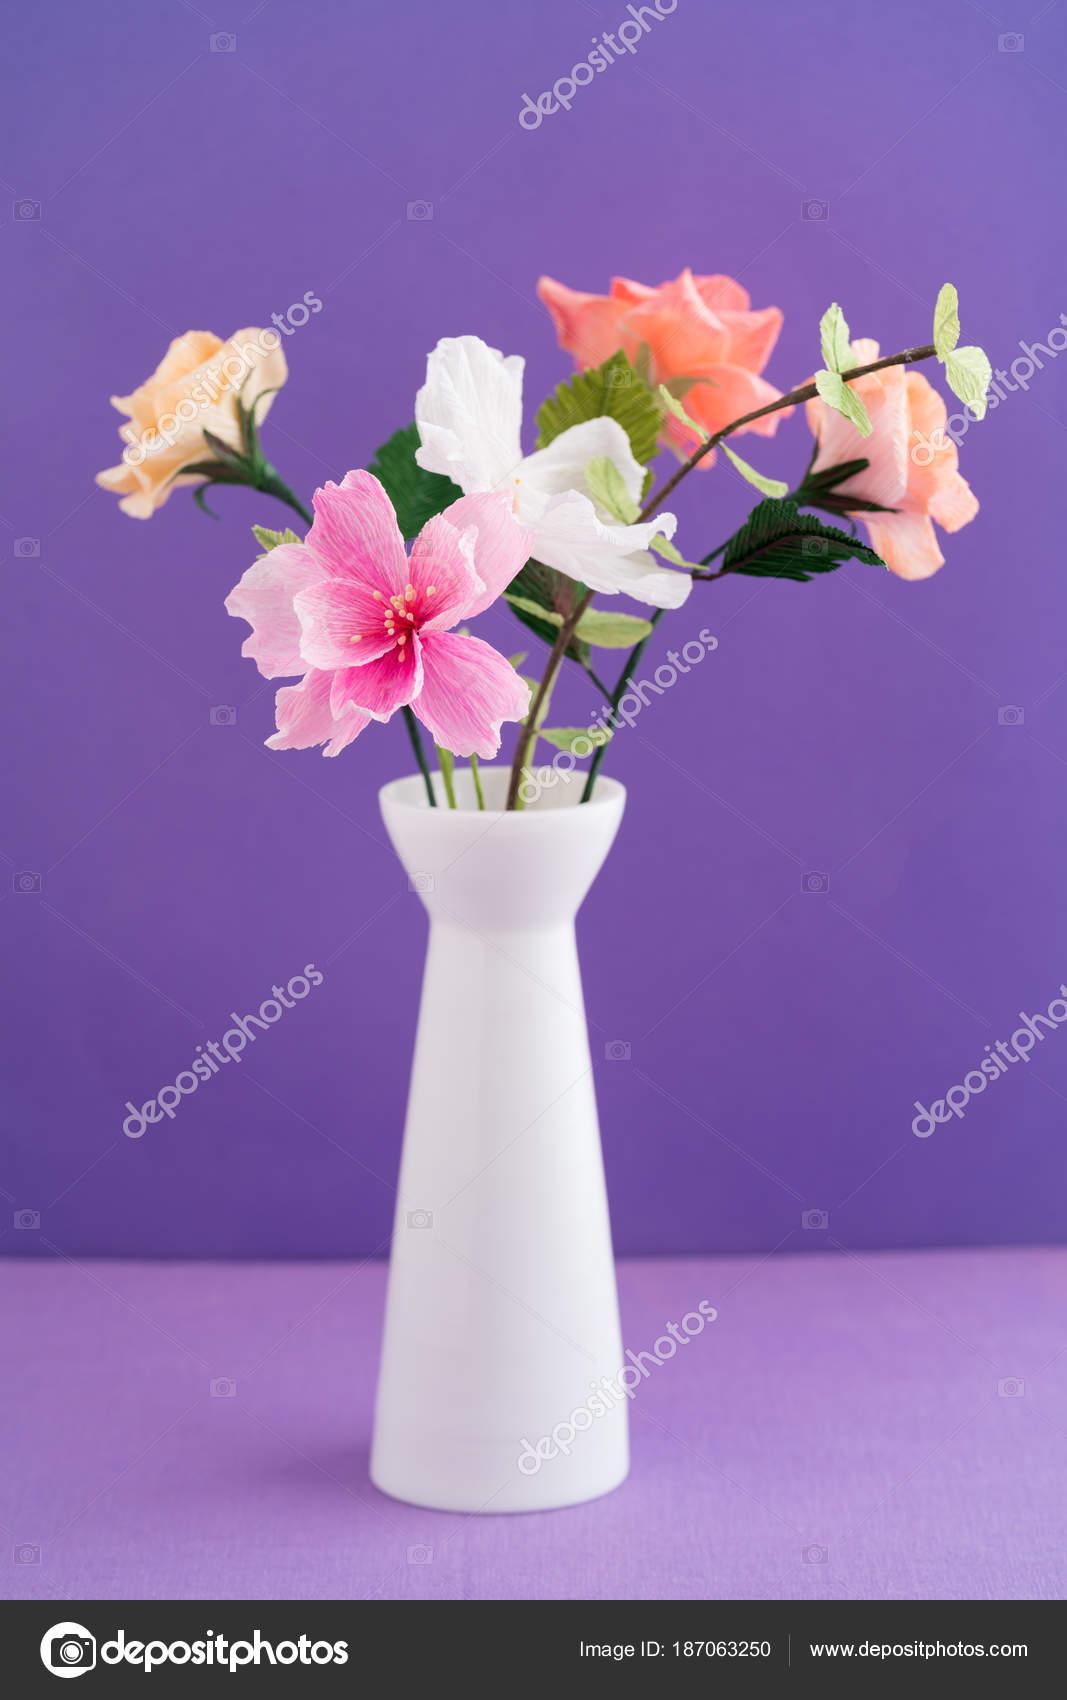 Crepe paper flower bouquet stock photo ecoelfen 187063250 crepe paper flower bouquet with cosmos roses and eucalyptus in a vase on purple photo by ecoelfen izmirmasajfo